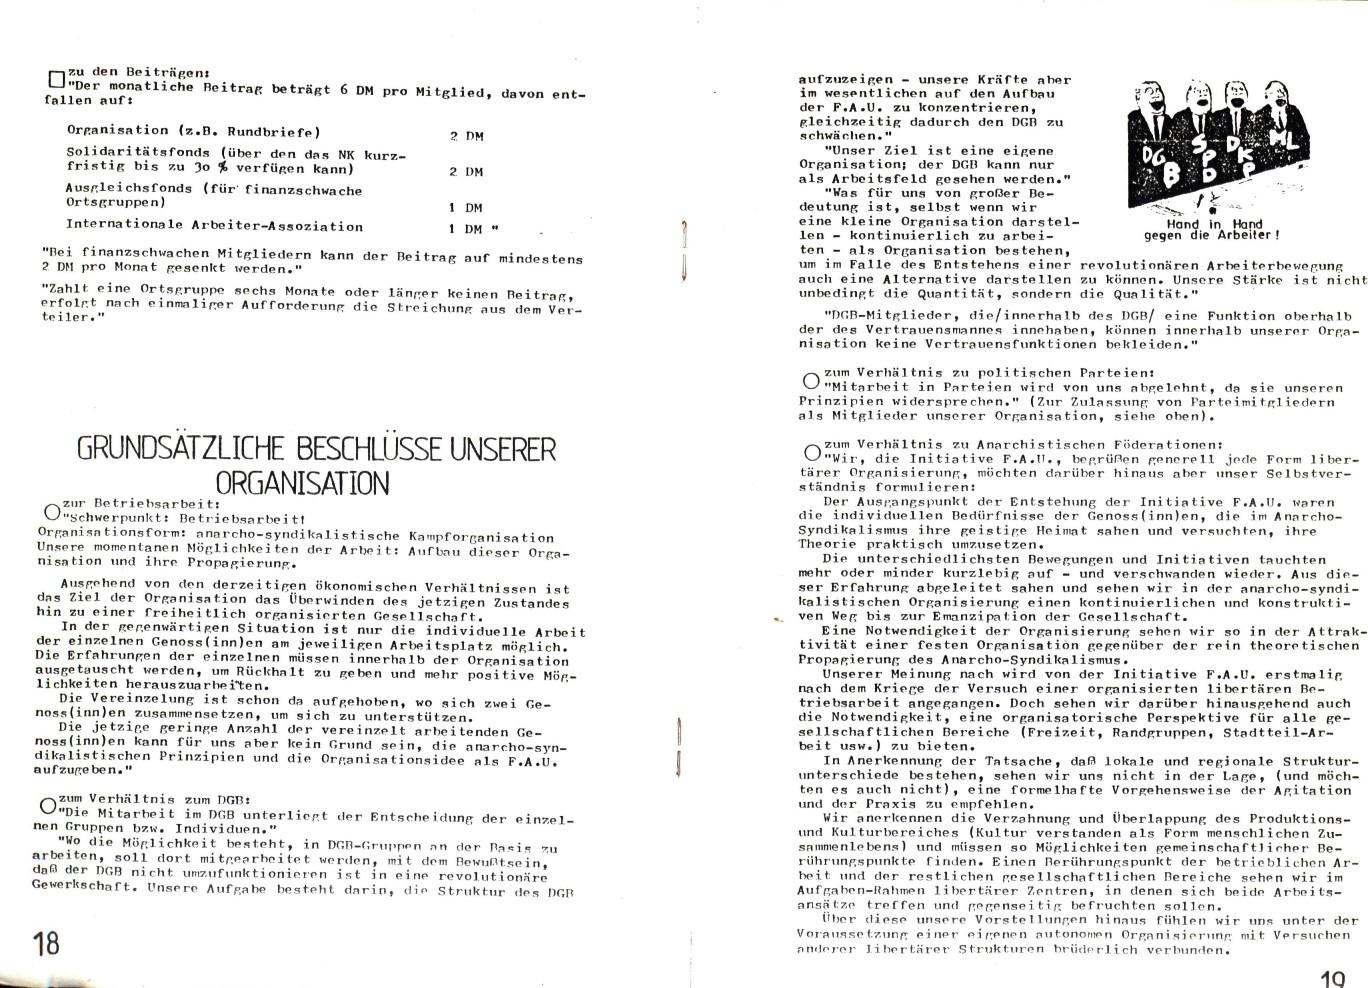 FAU_1979_Arbeitsgrundlage_10